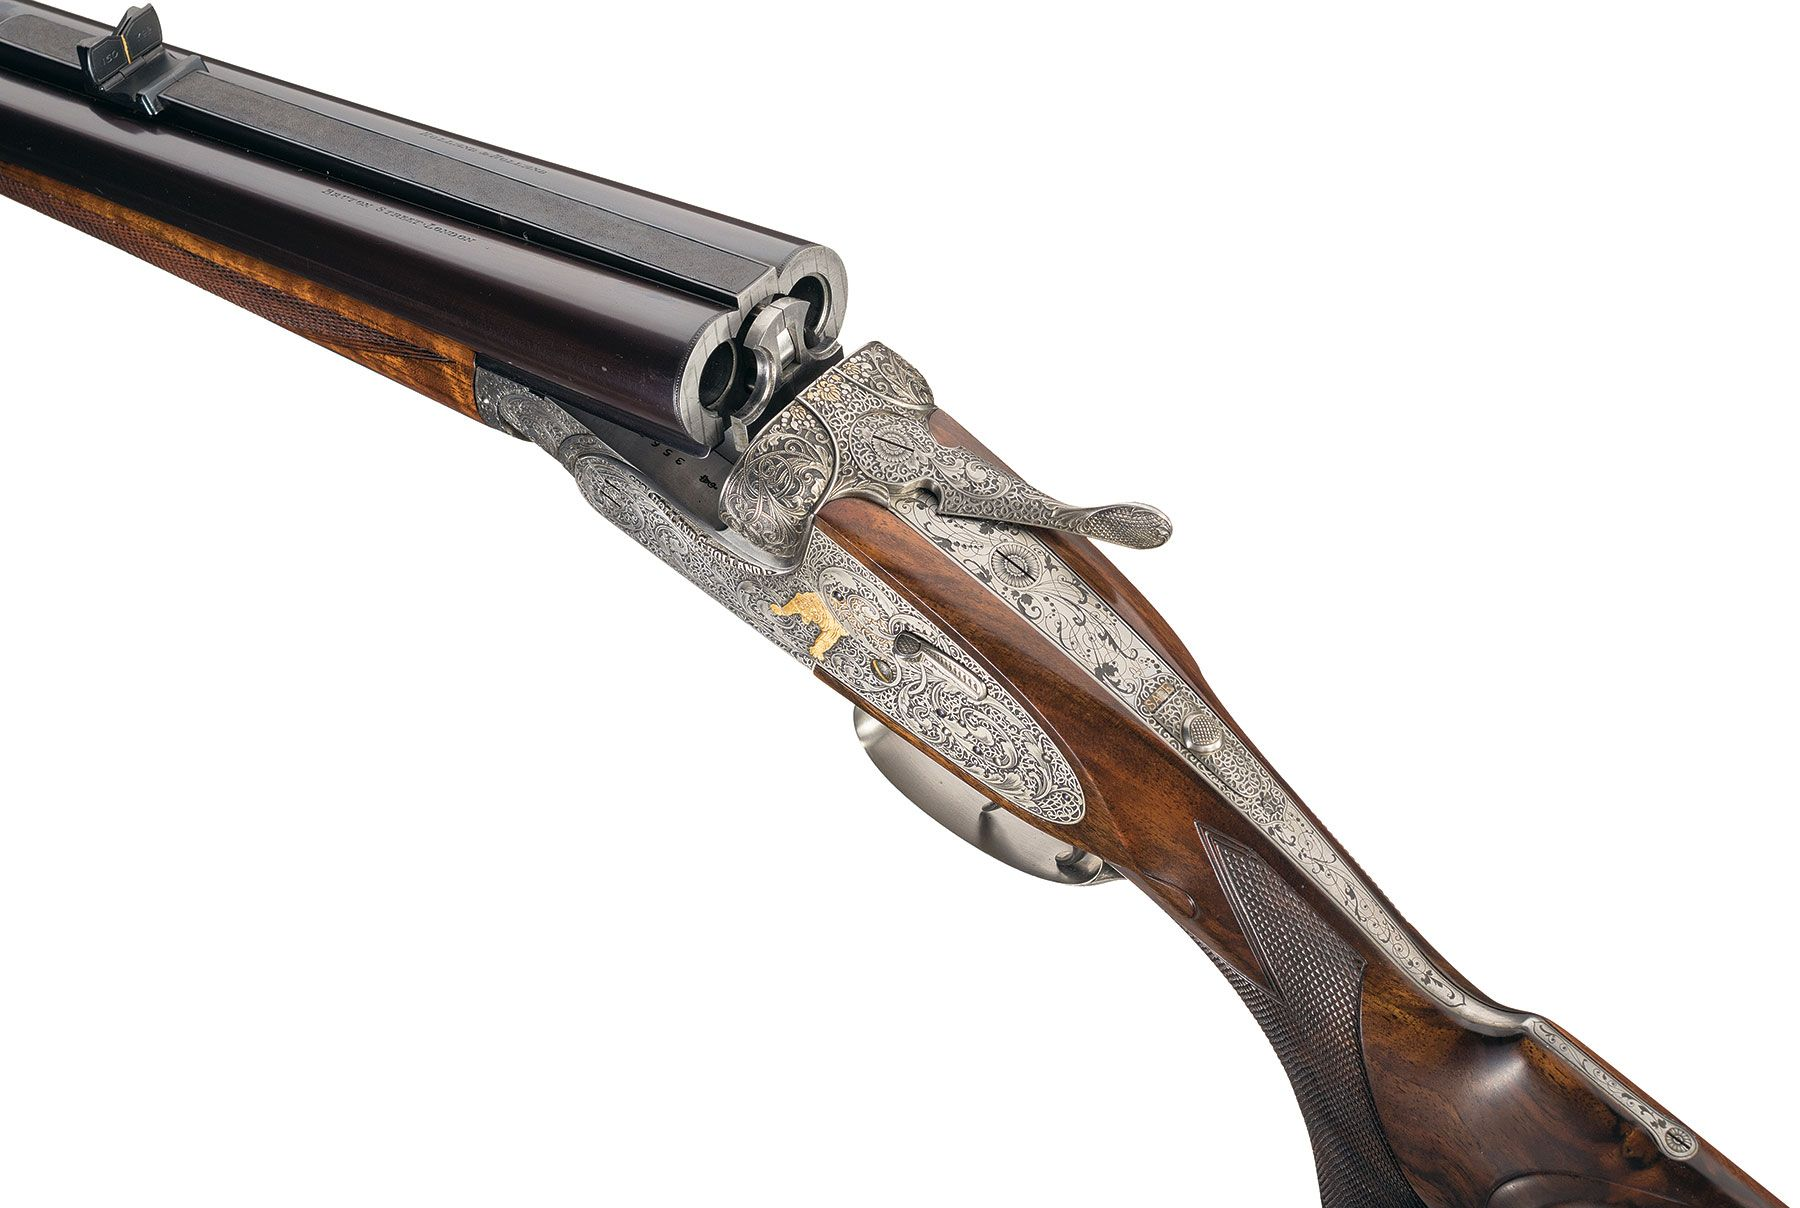 Holland & Holland 500-465 double rifle breech gape